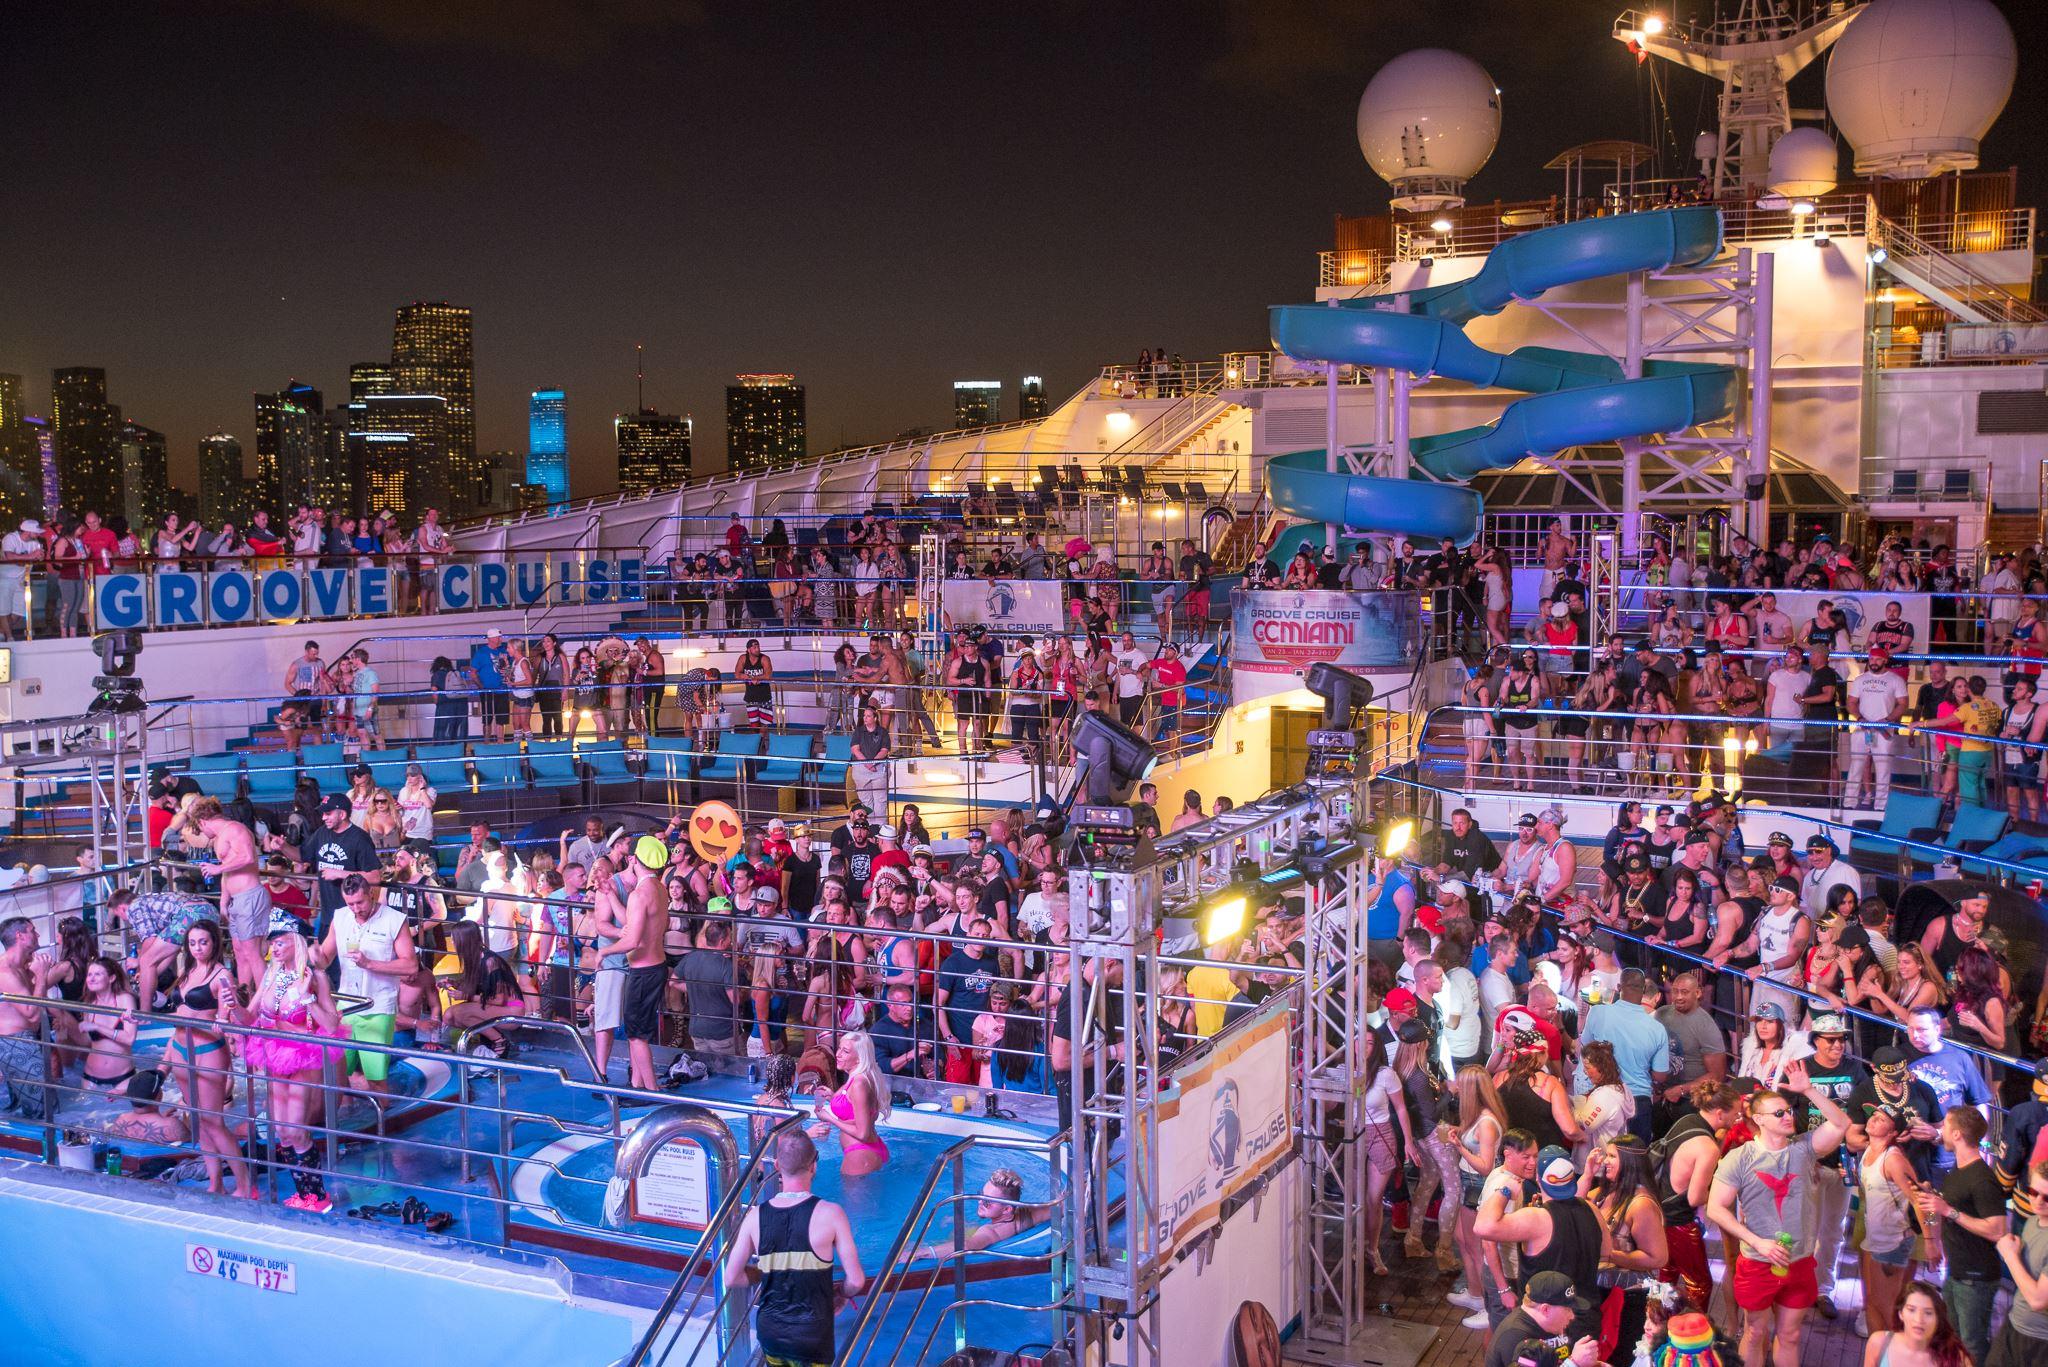 Groove Cruise 2020 - Best Florida Music Festivals